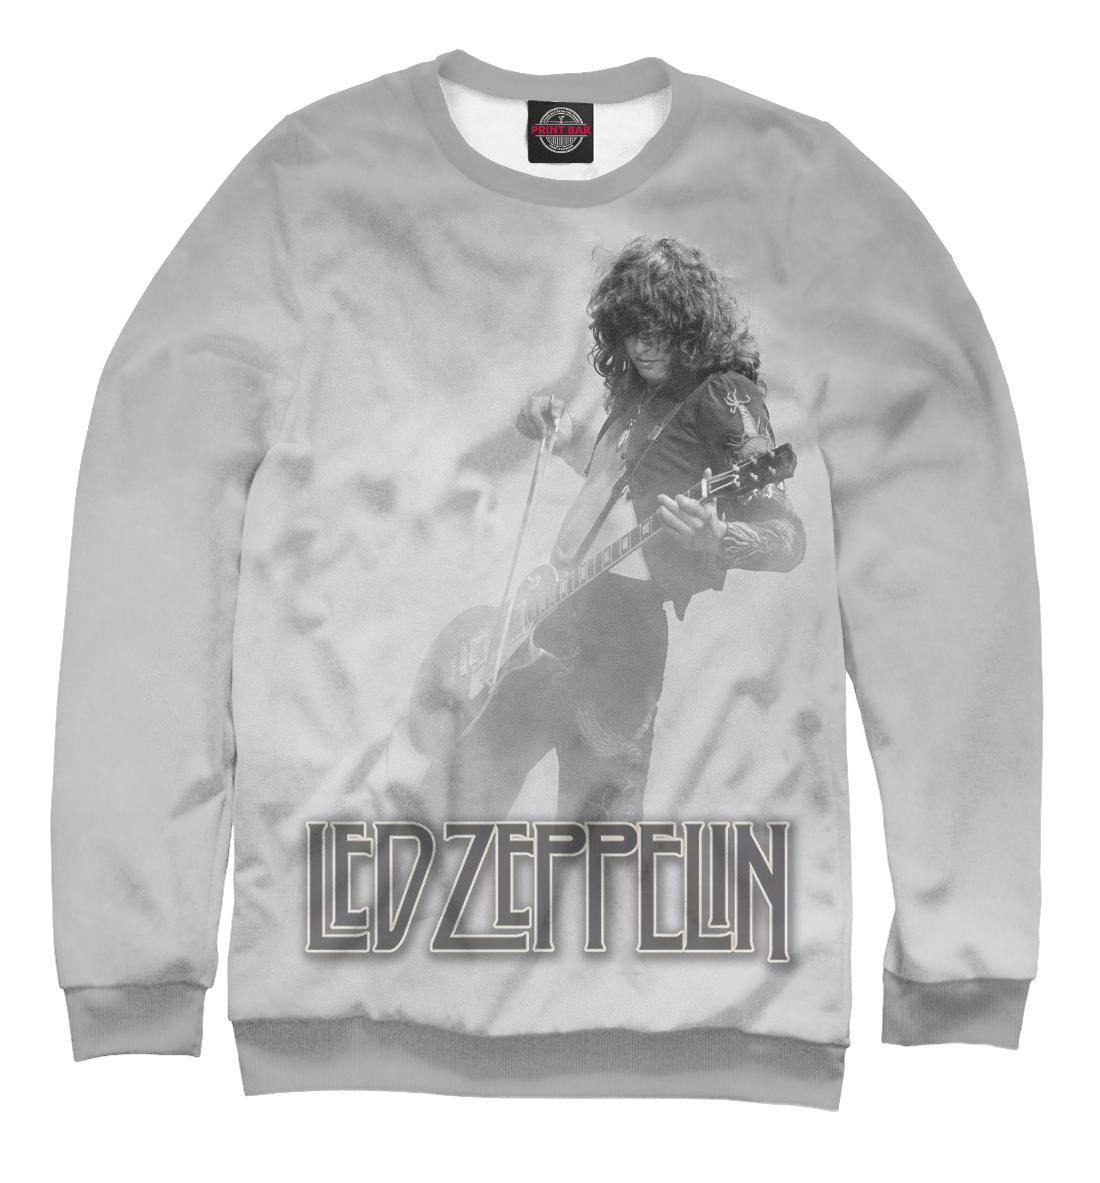 Купить Led Zeppelin Jimmy Page, Printbar, Свитшоты, MZK-568162-swi-2